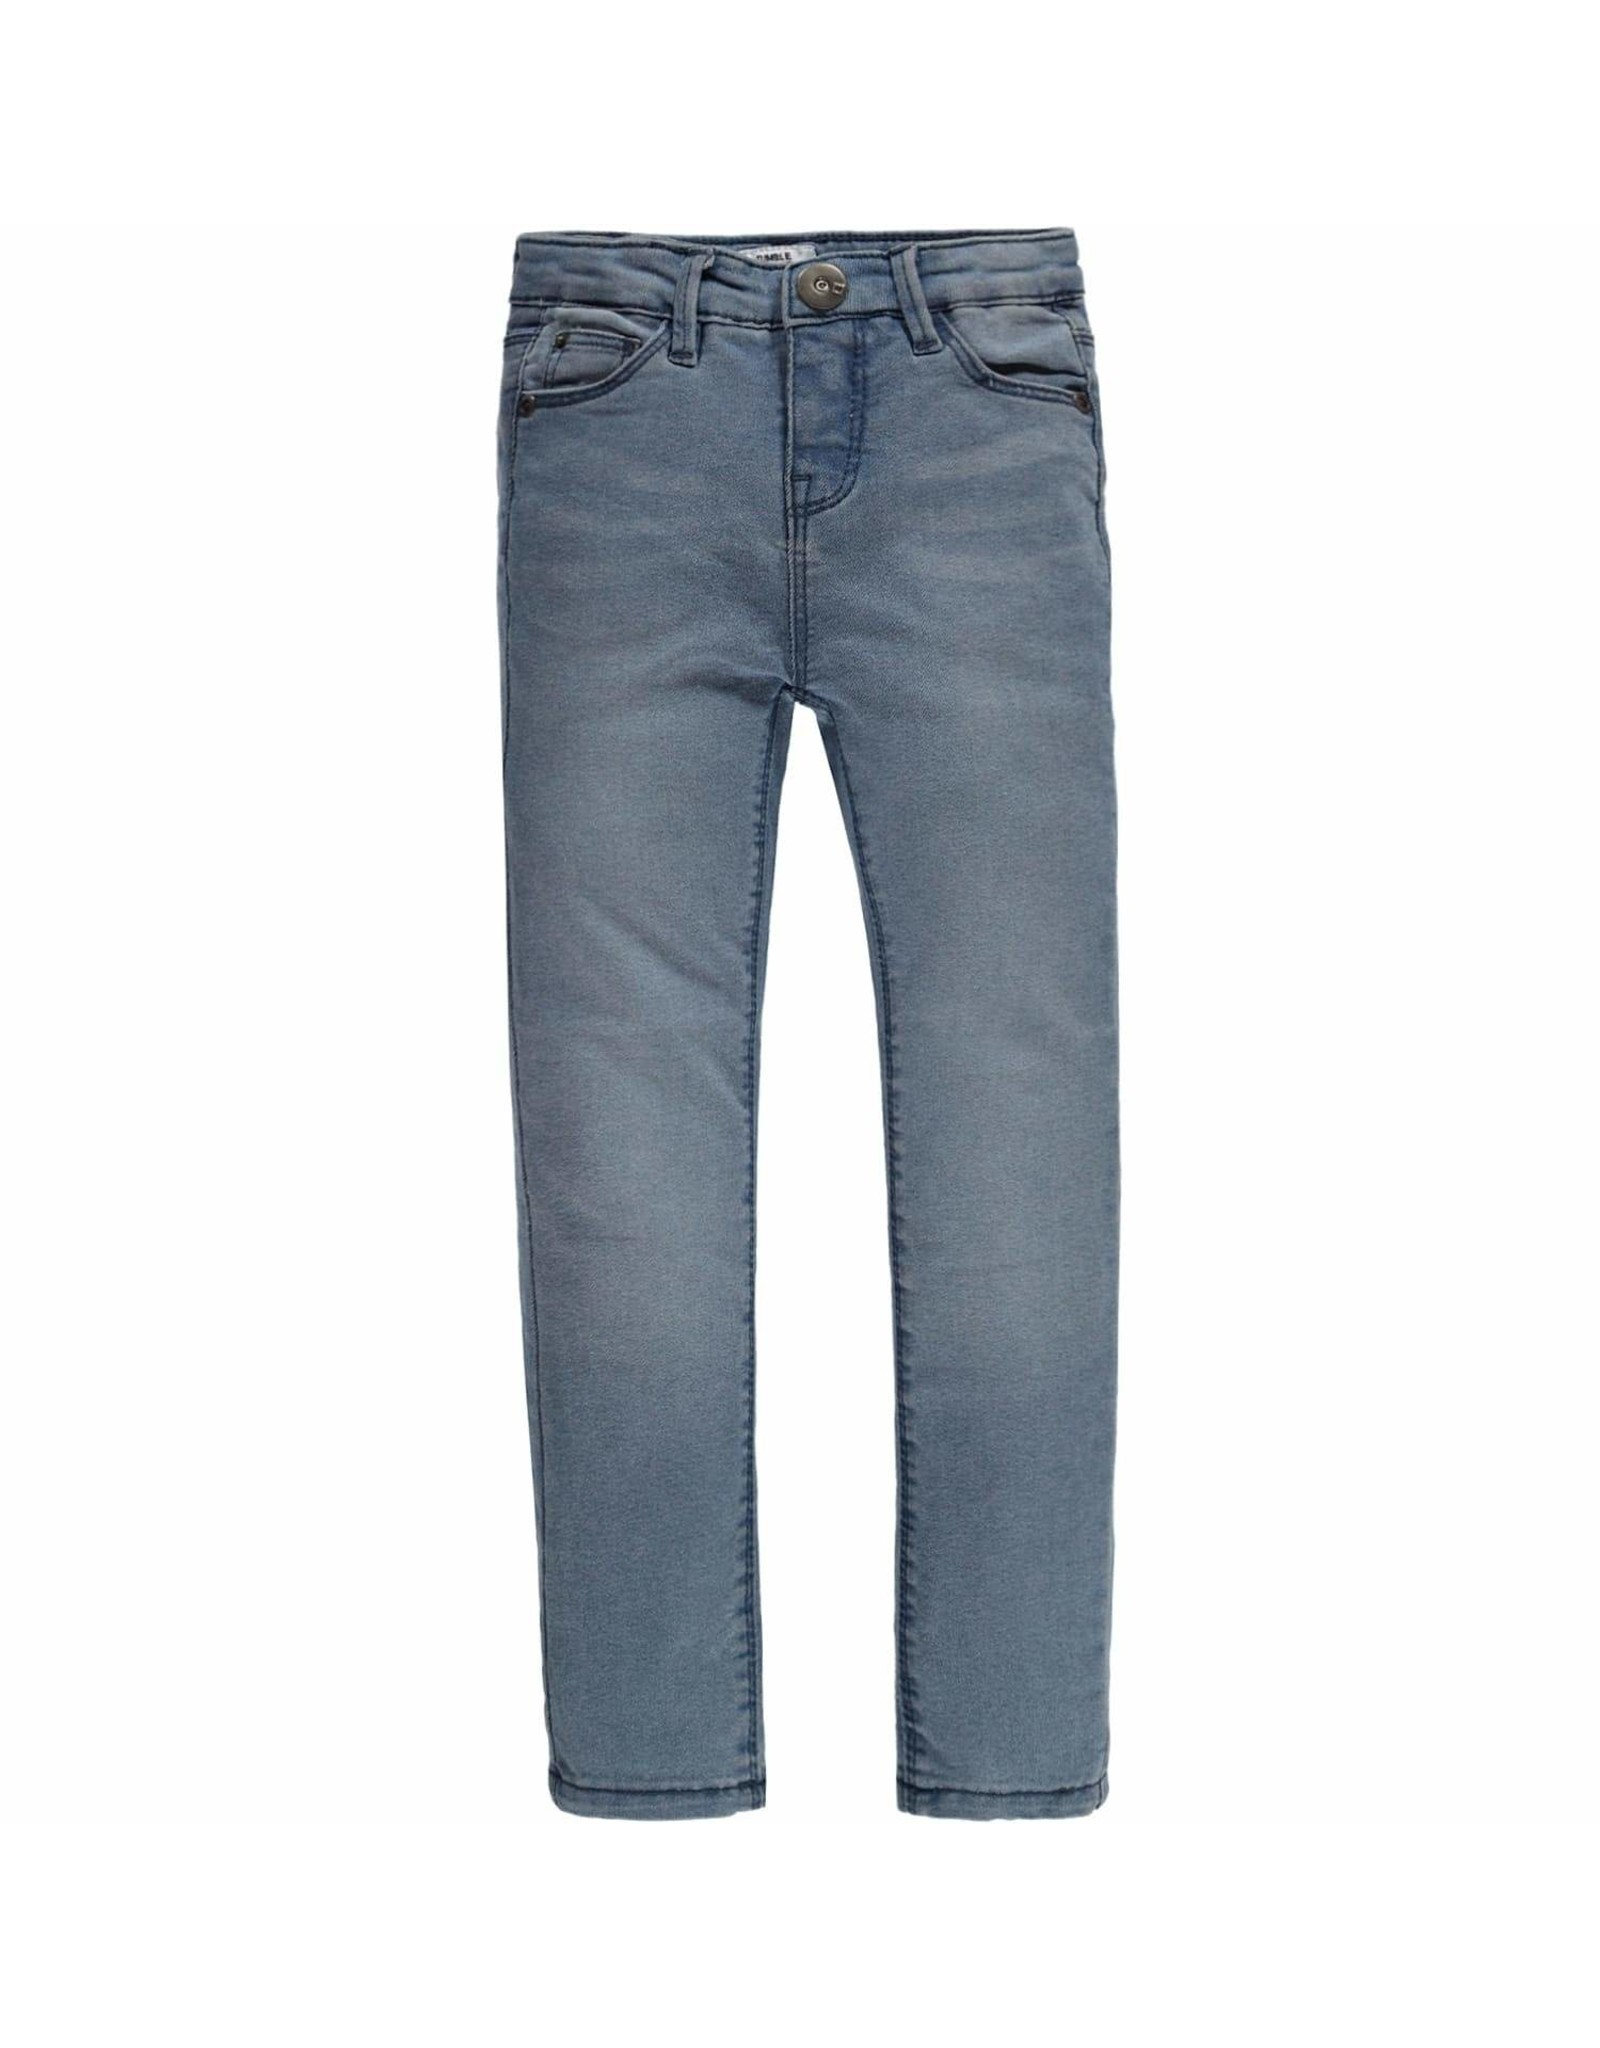 Tumble 'n dry jeans pearl